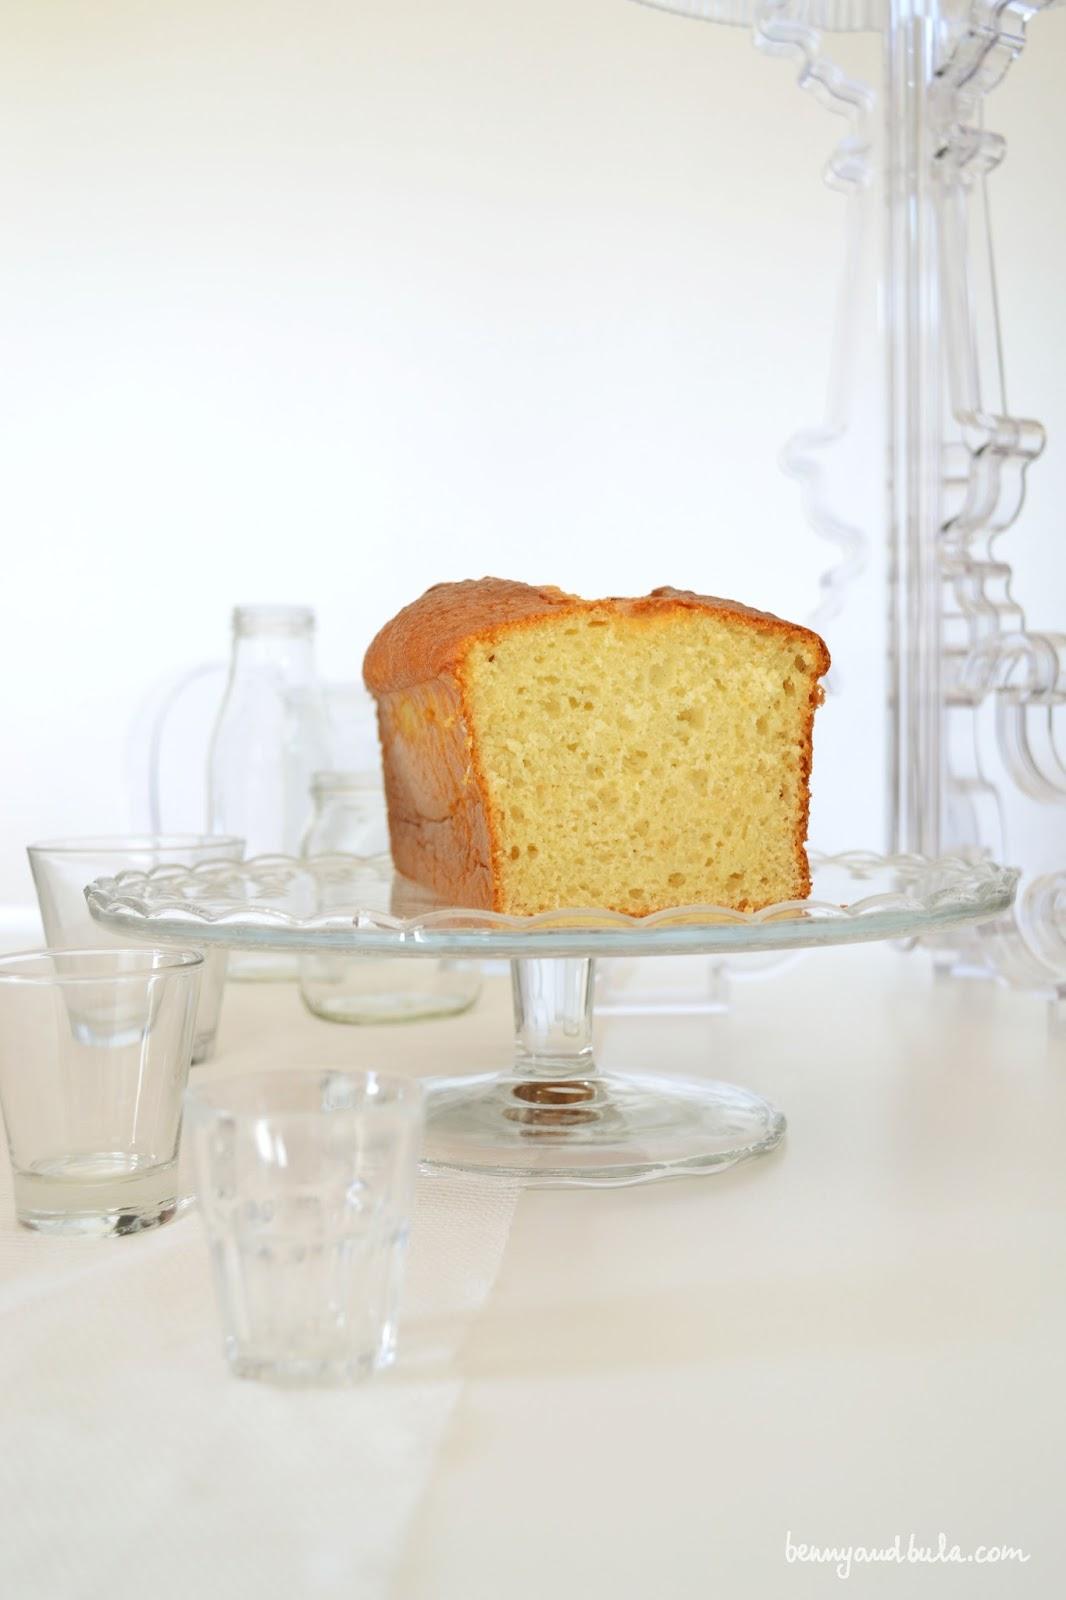 ricetta plumcake classico con yogurt/ yogurt loaf cake recipe